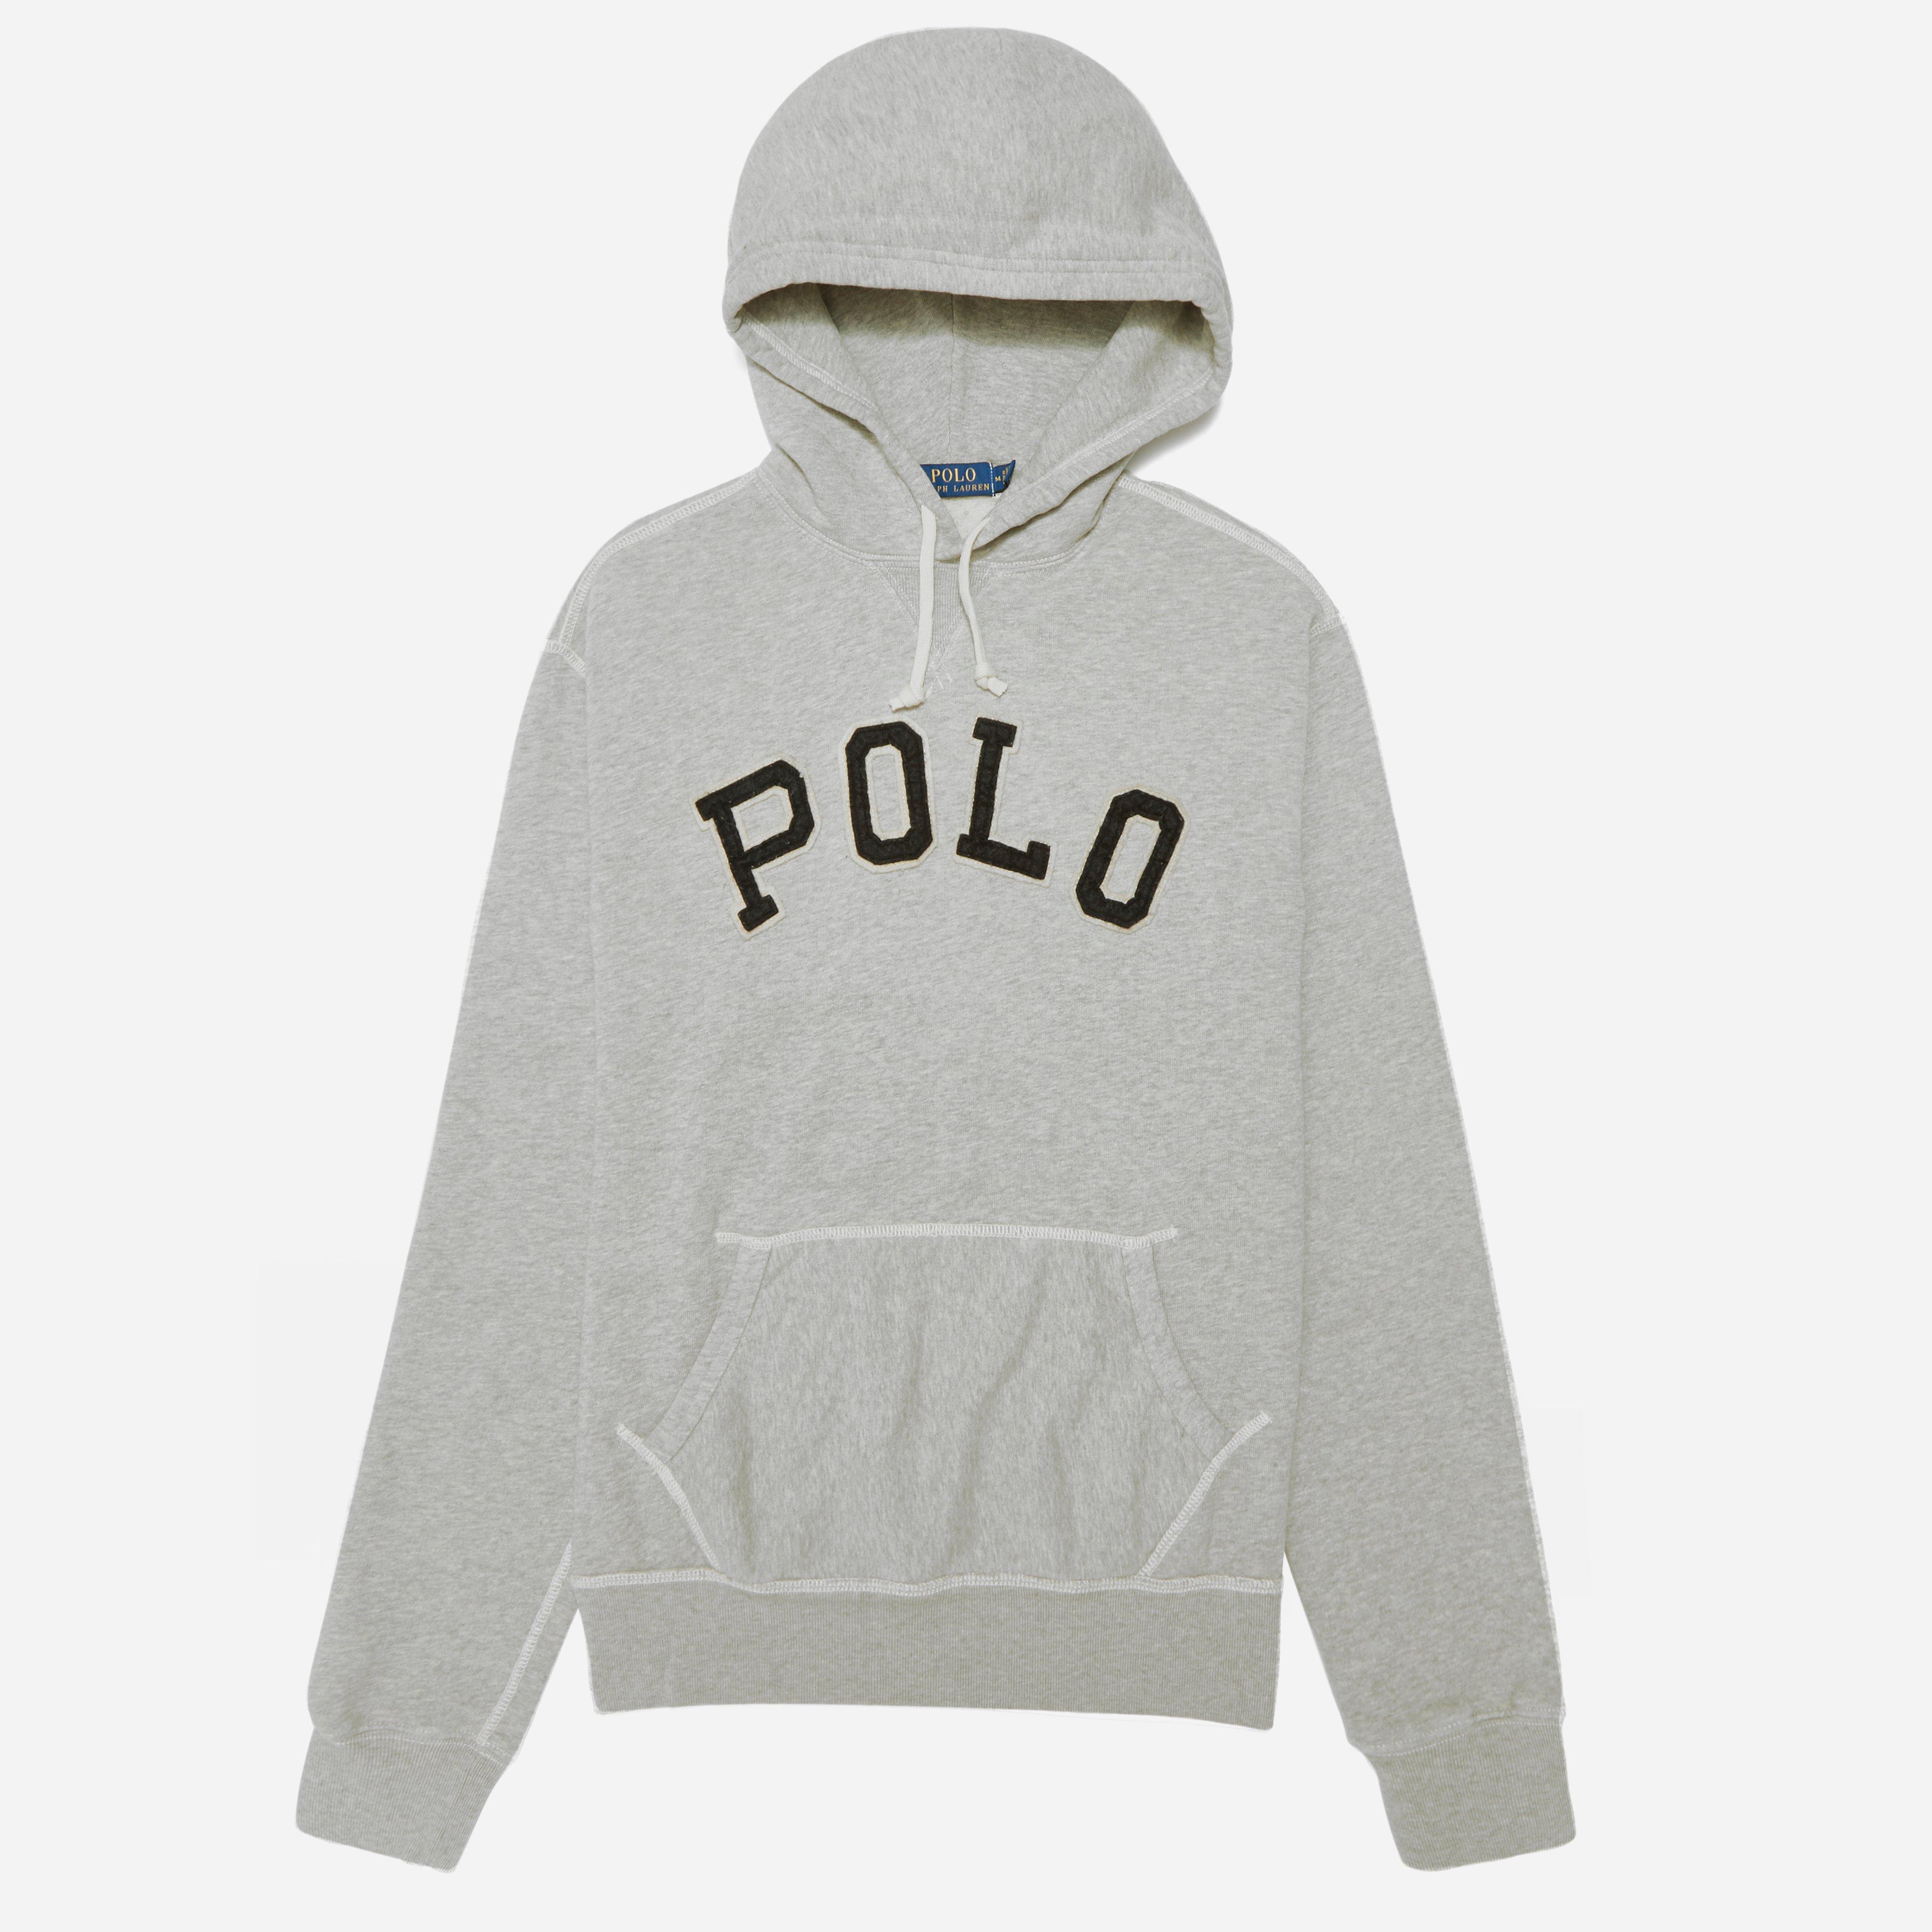 Polo Ralph Lauren Vintage Hoodie